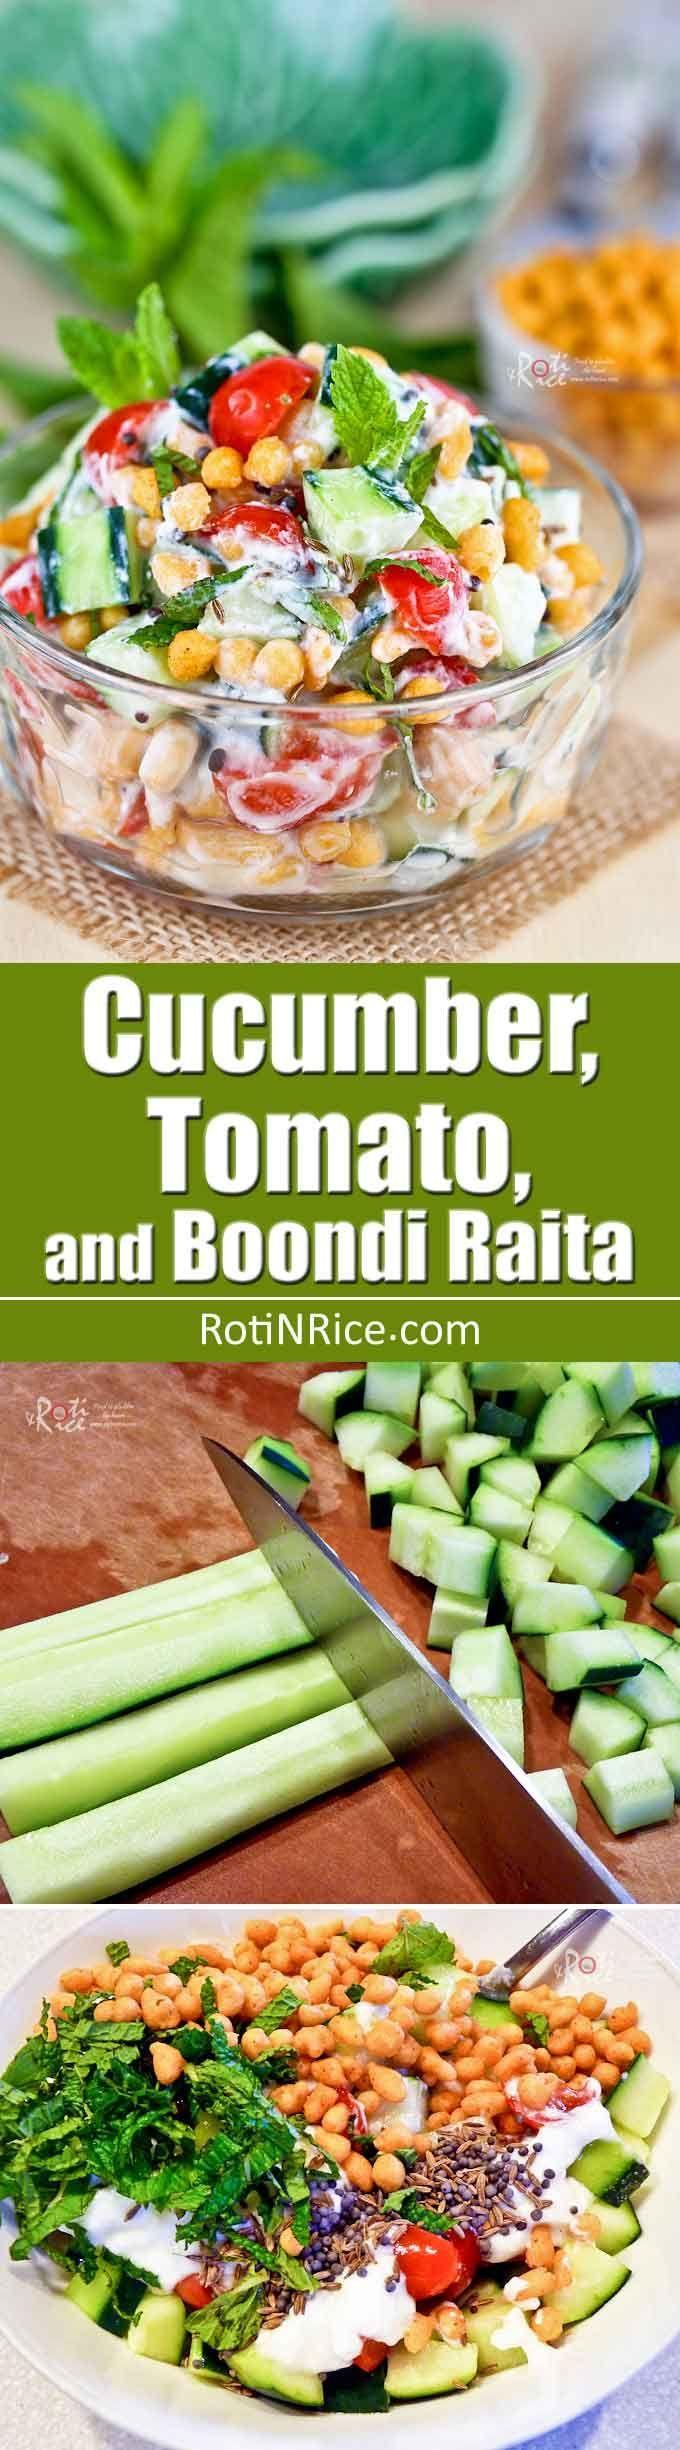 Cucumber Tomato And Boondi Raita Recipe With Images